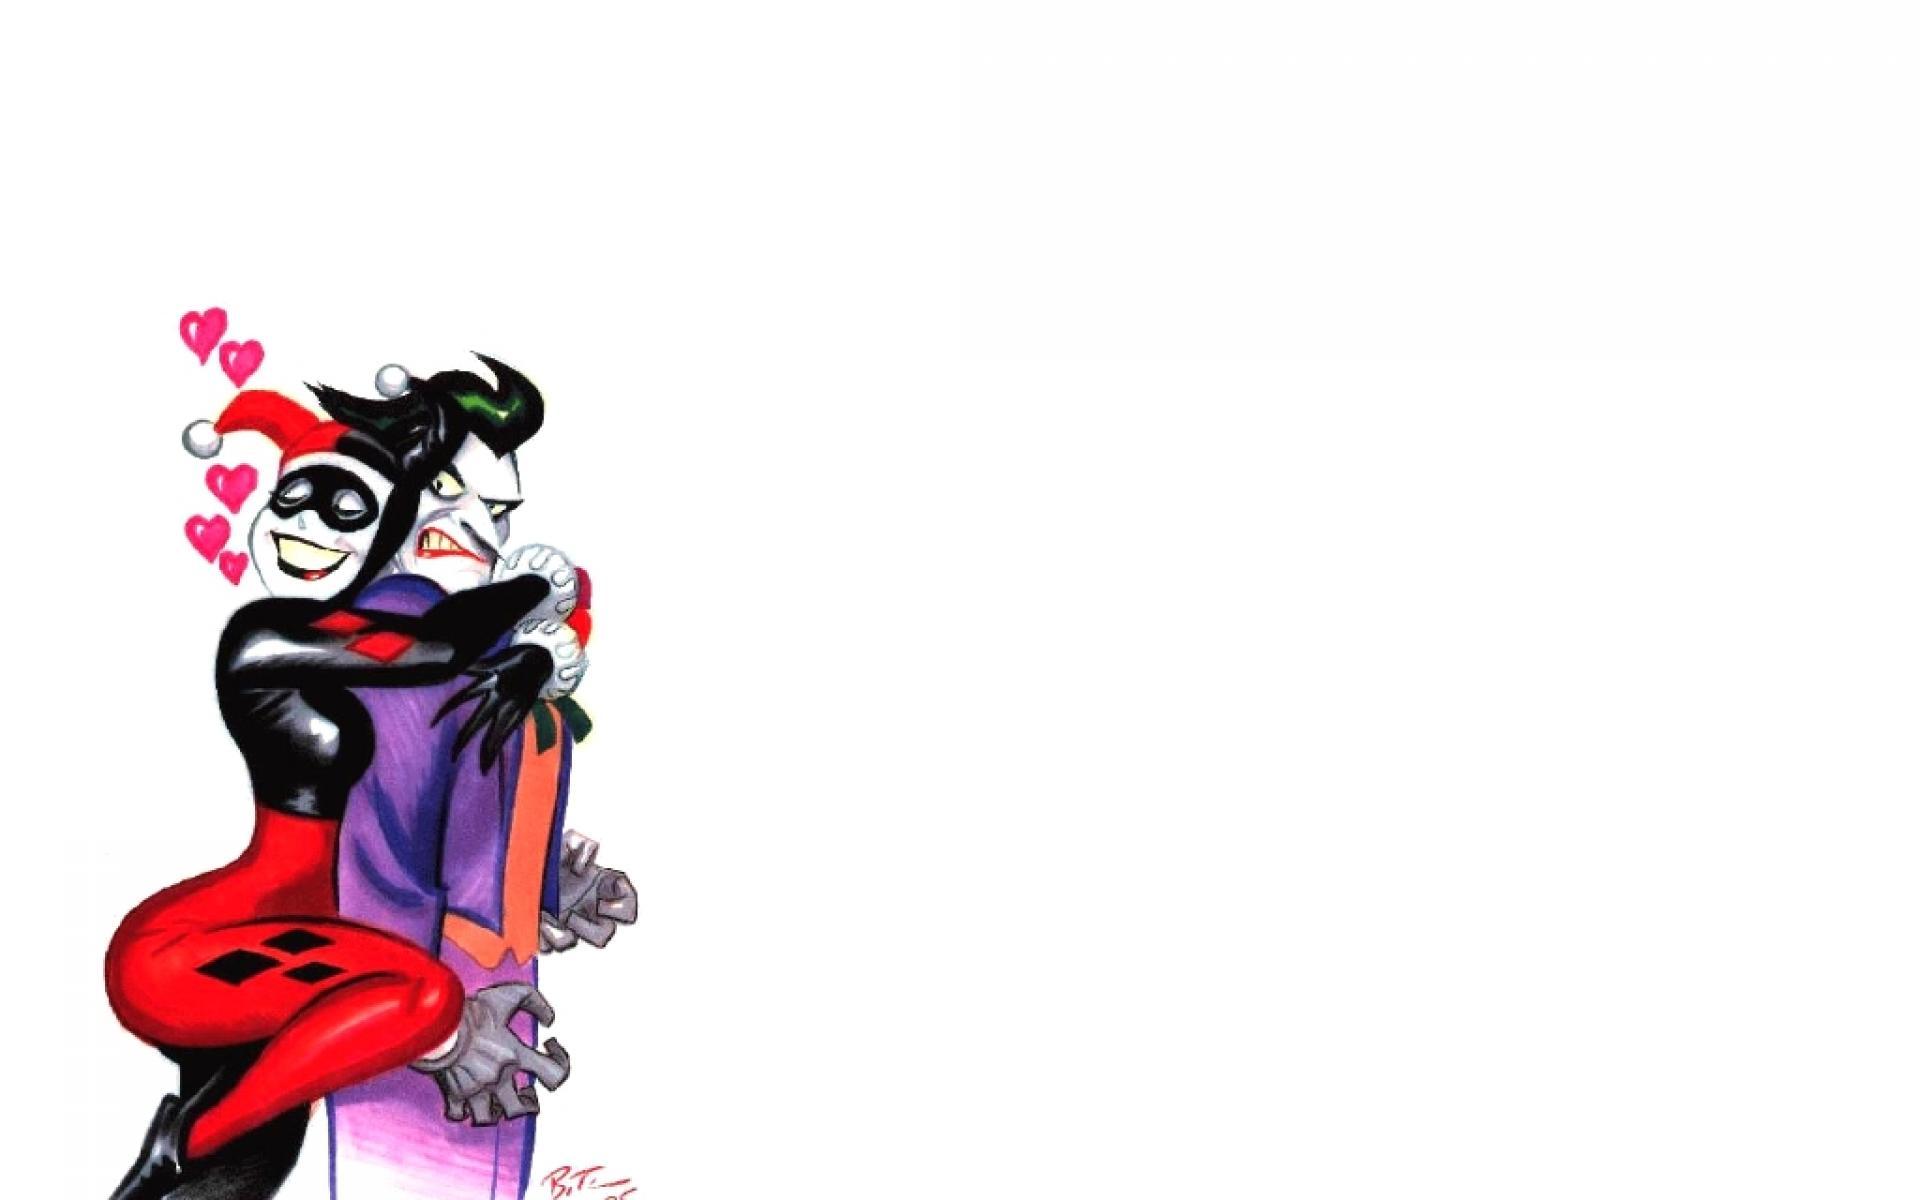 Harley Quinn and Joker Wallpaper 1920x1200